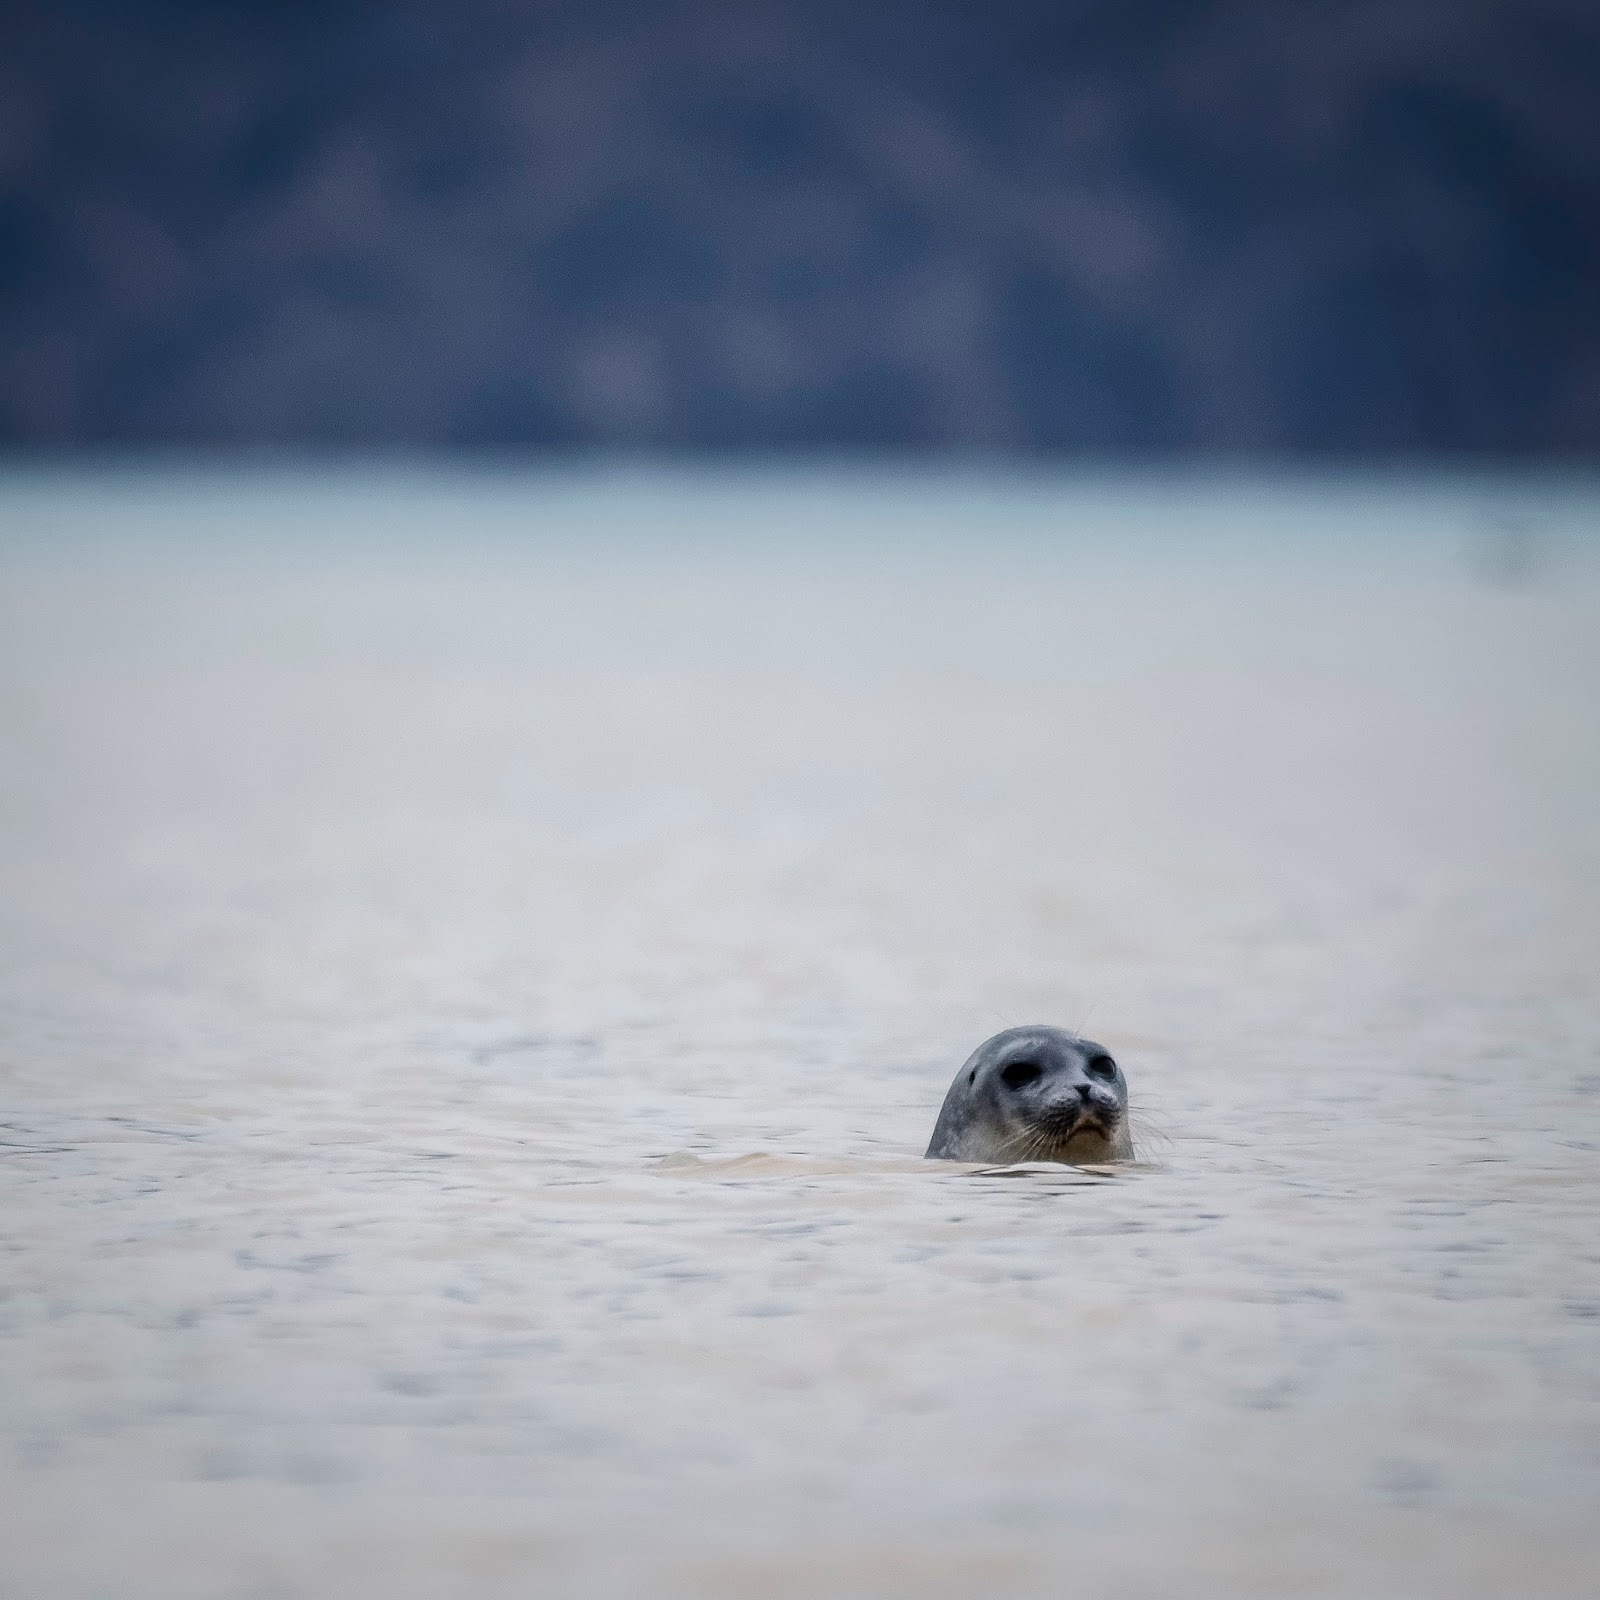 phoque nordenskiold svalbard spitzberg